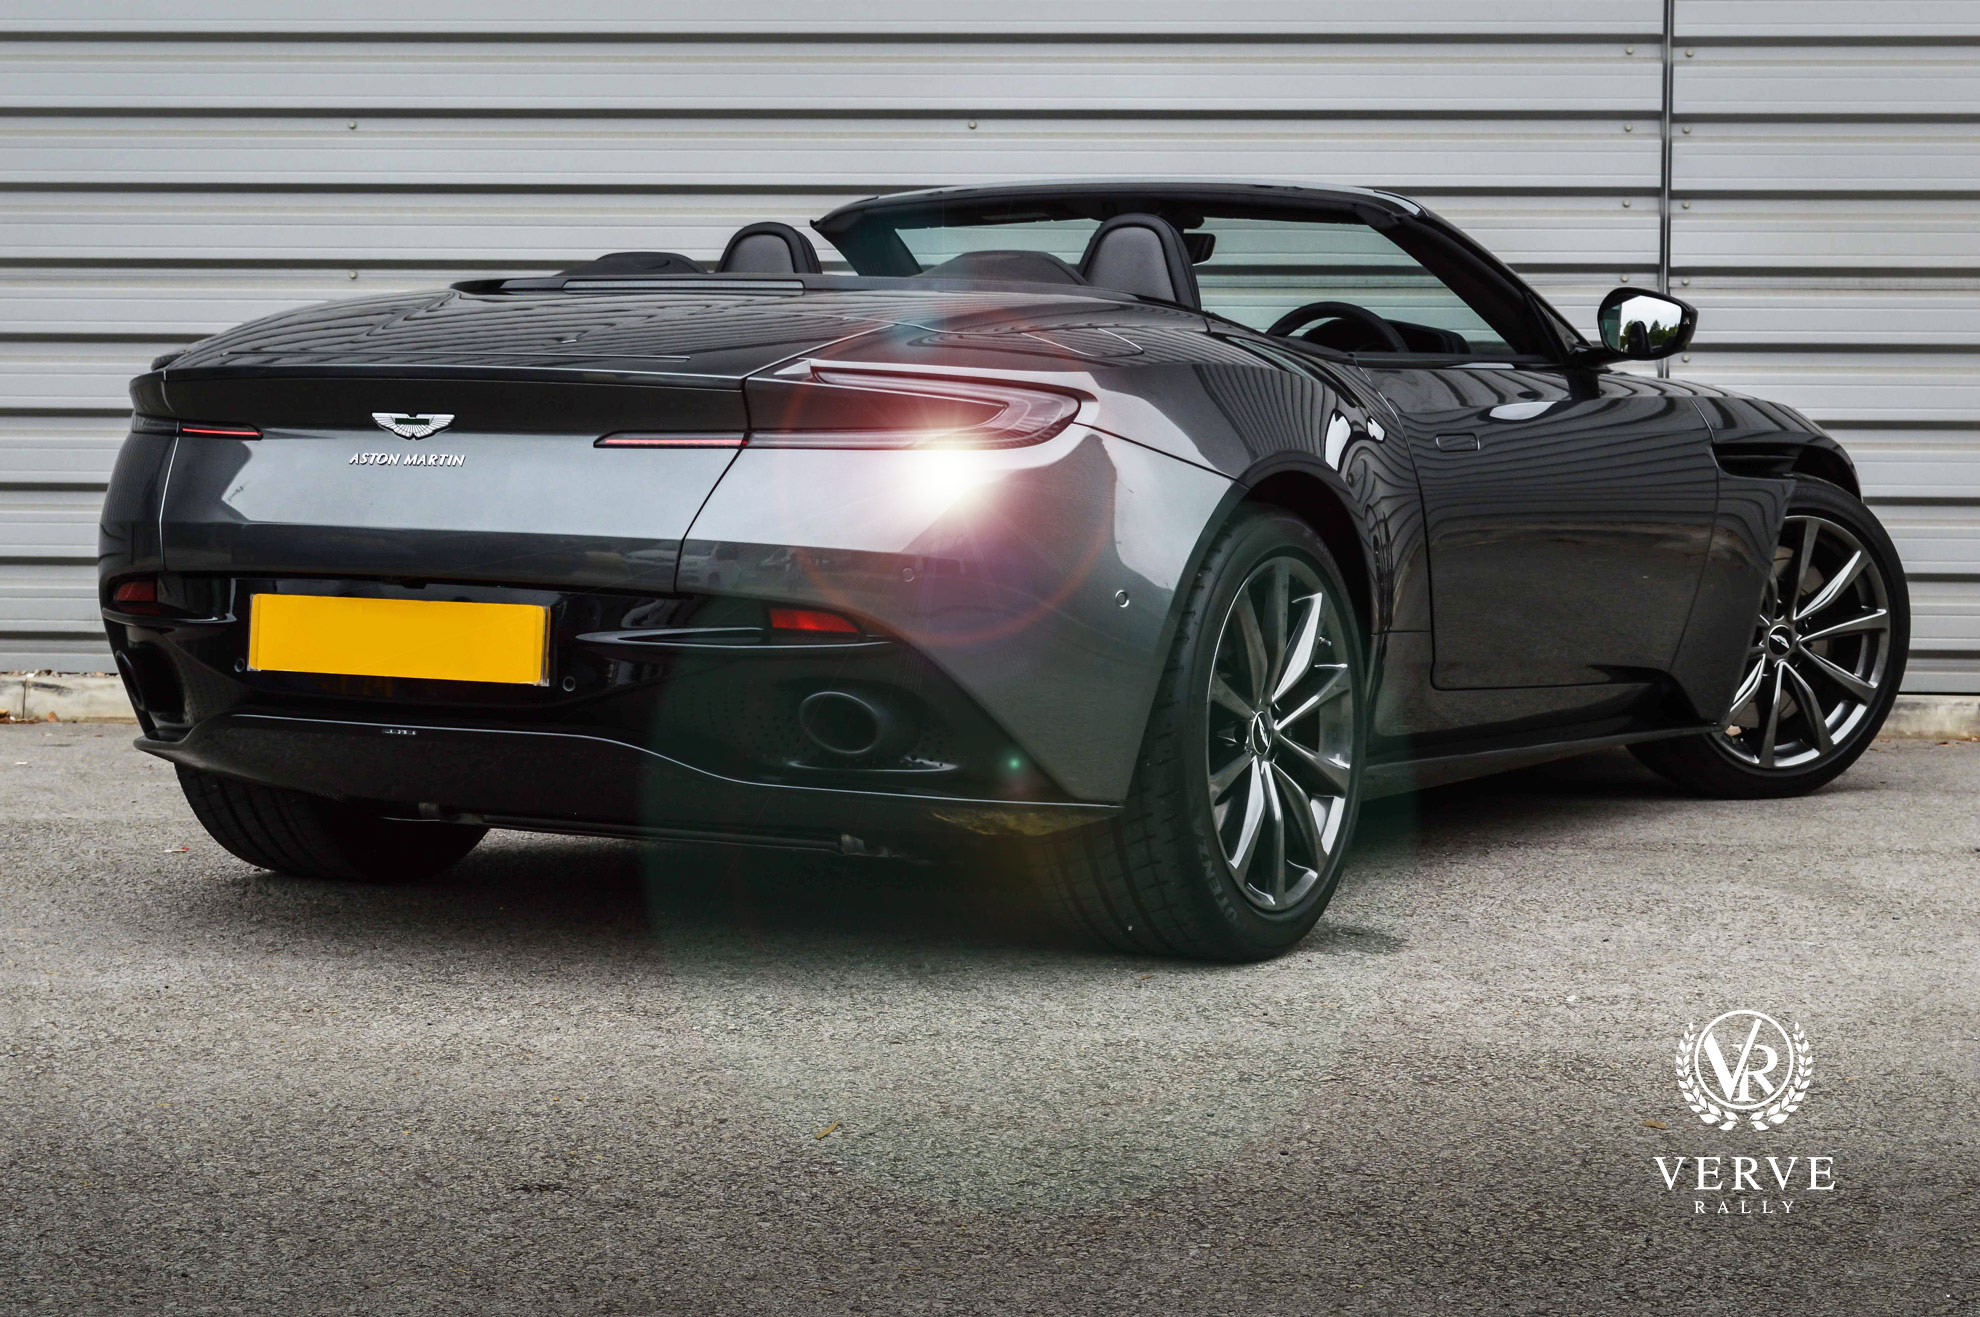 Verve Rally GT Supercars - Aston Martin DB11 (rear)